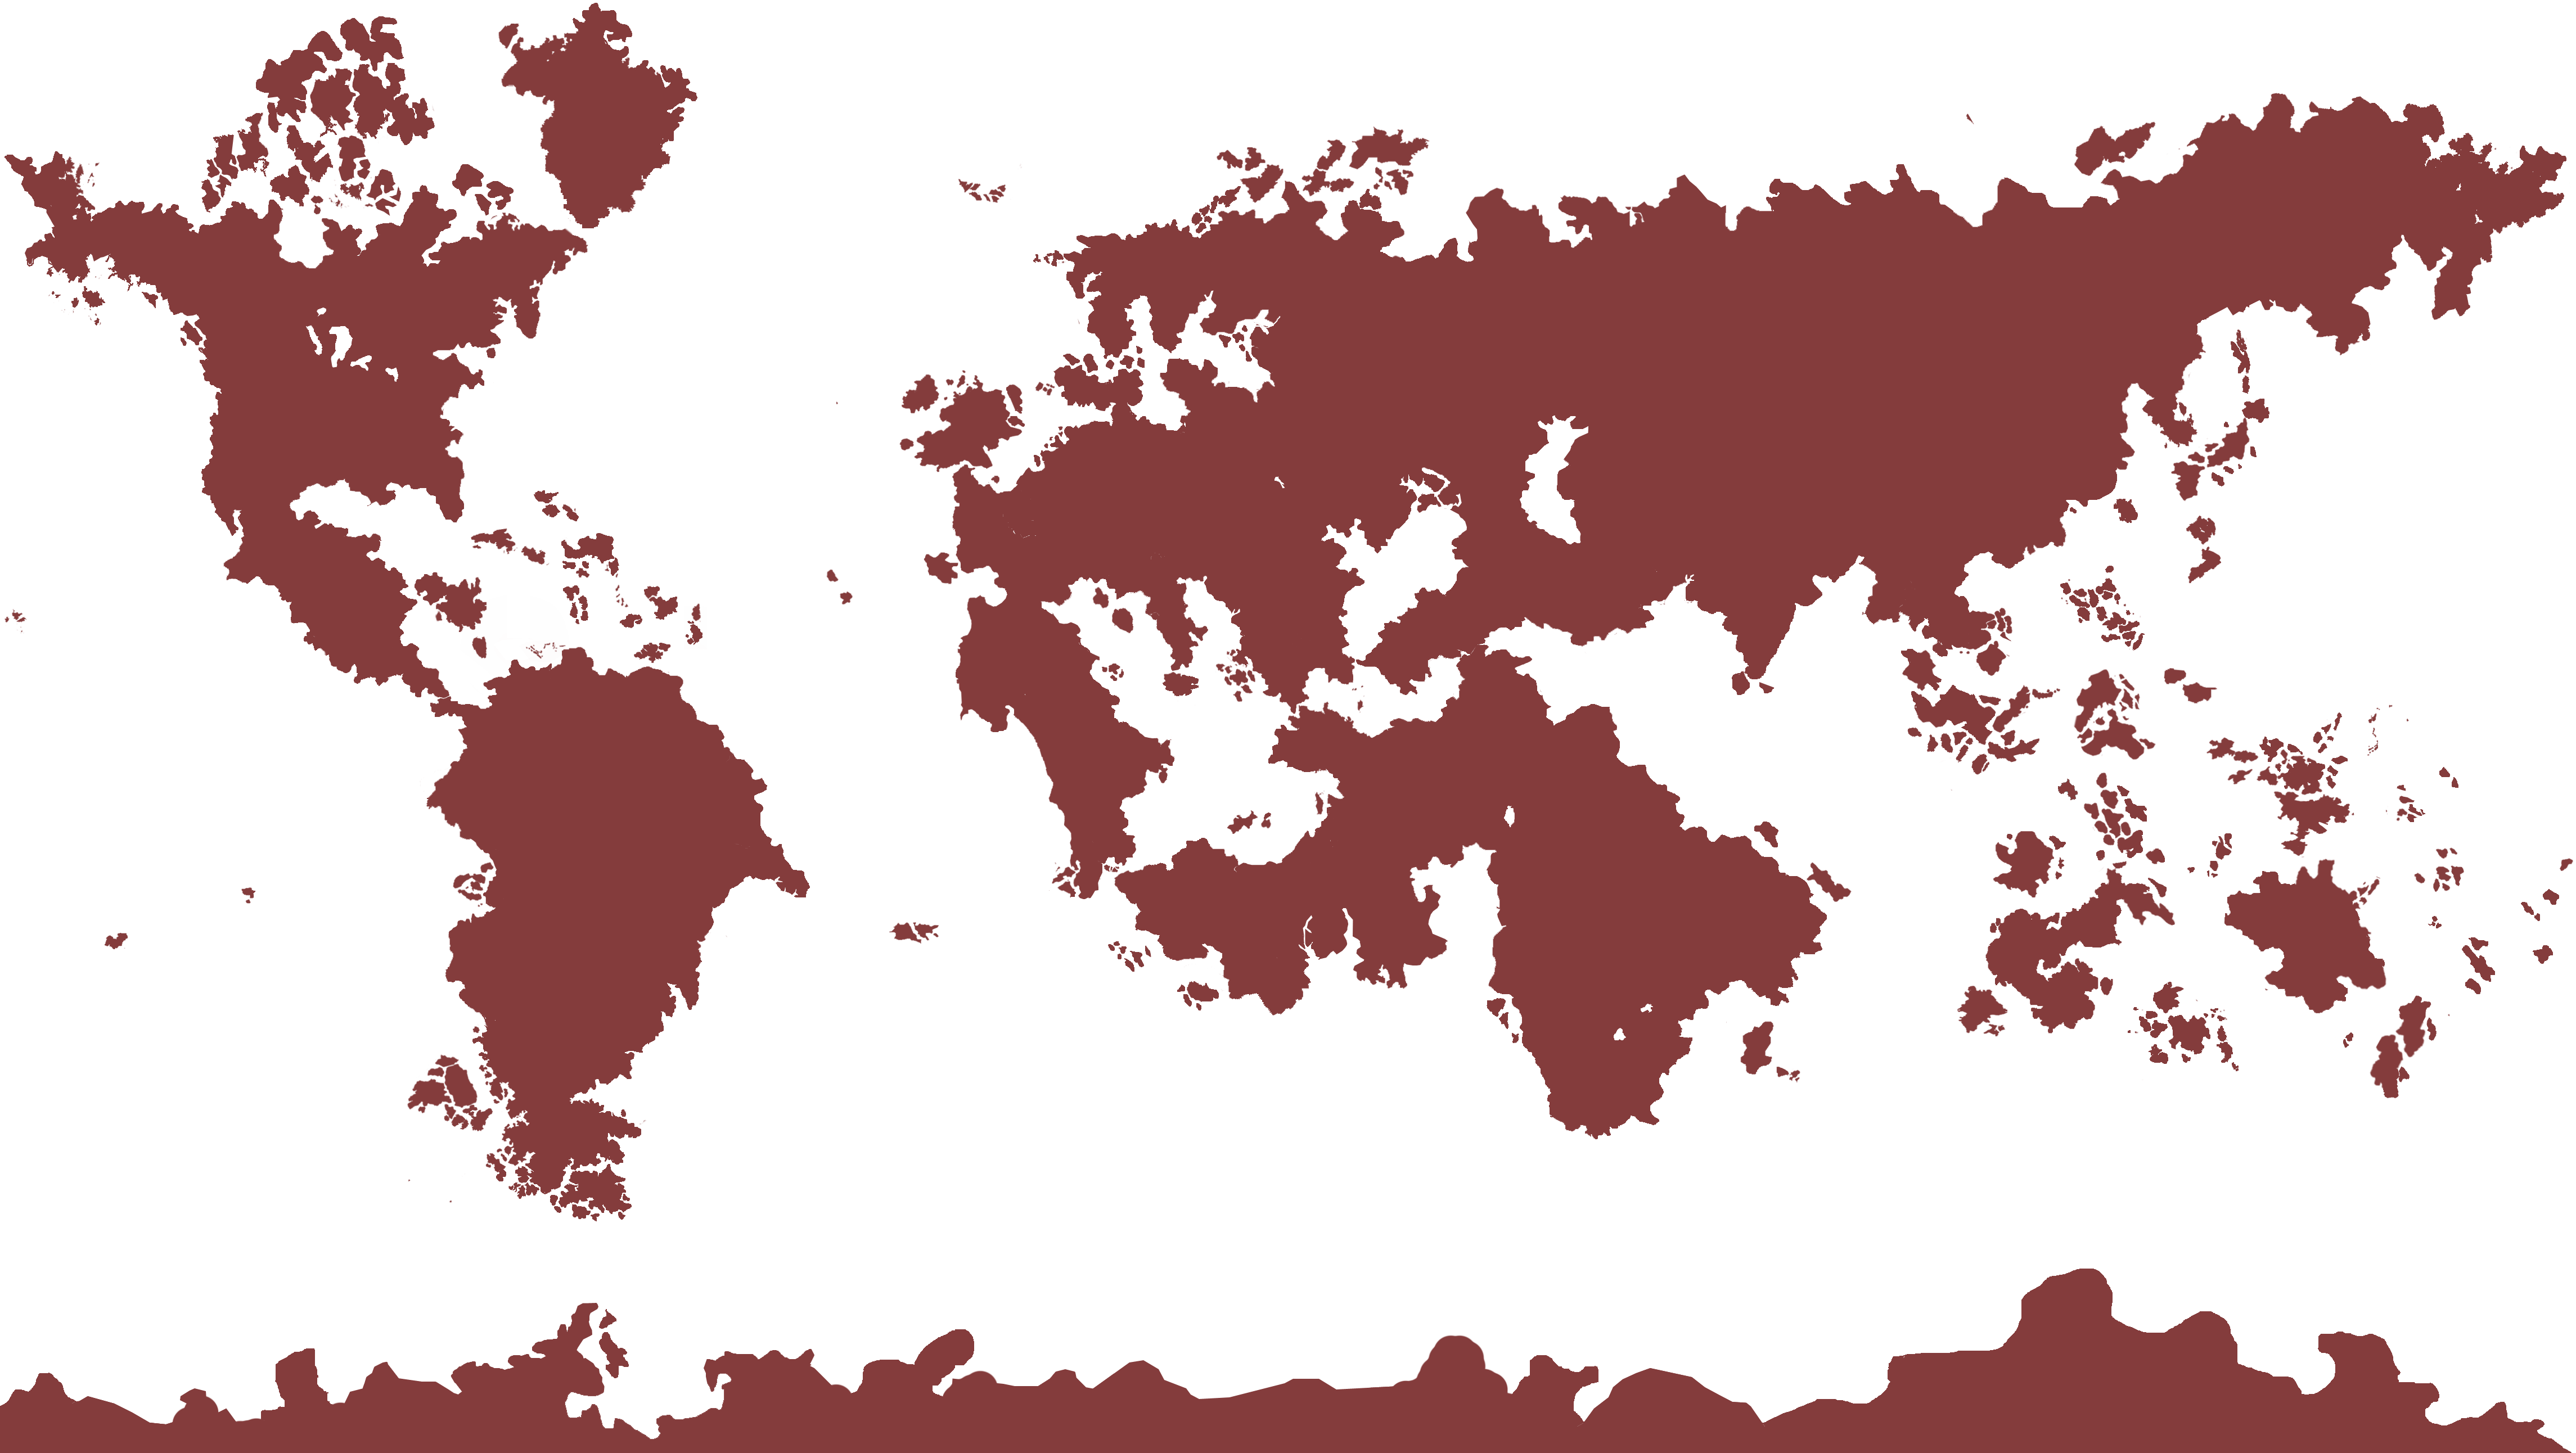 Mapa_de_Gapia_versi%C3%B3n_26_%28estilo_transparente%29.png